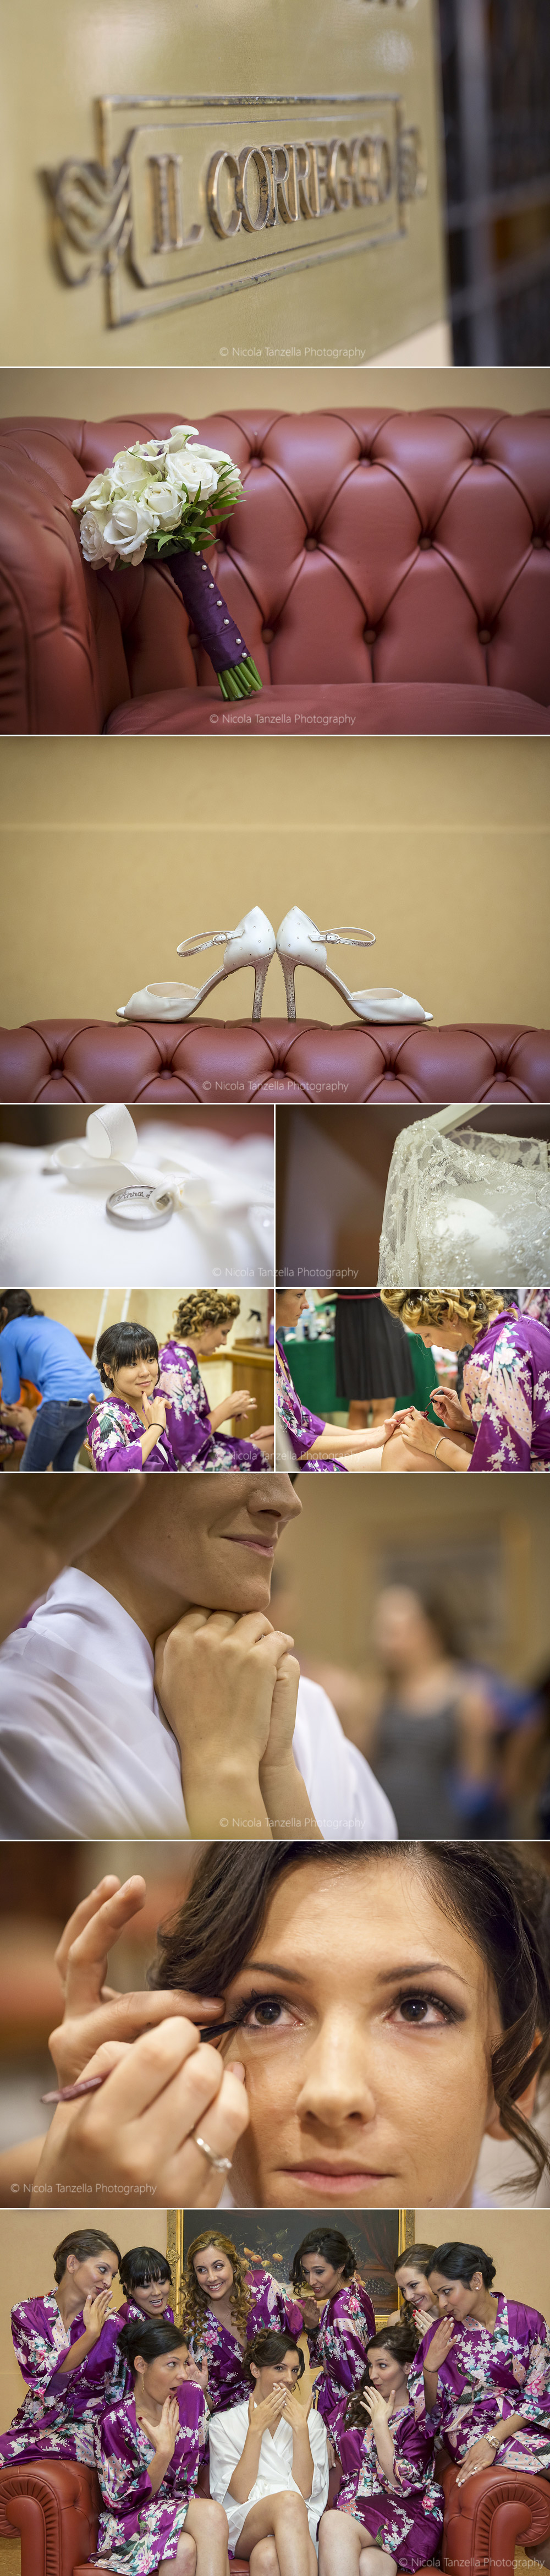 fotografo matrimonio modena - 001